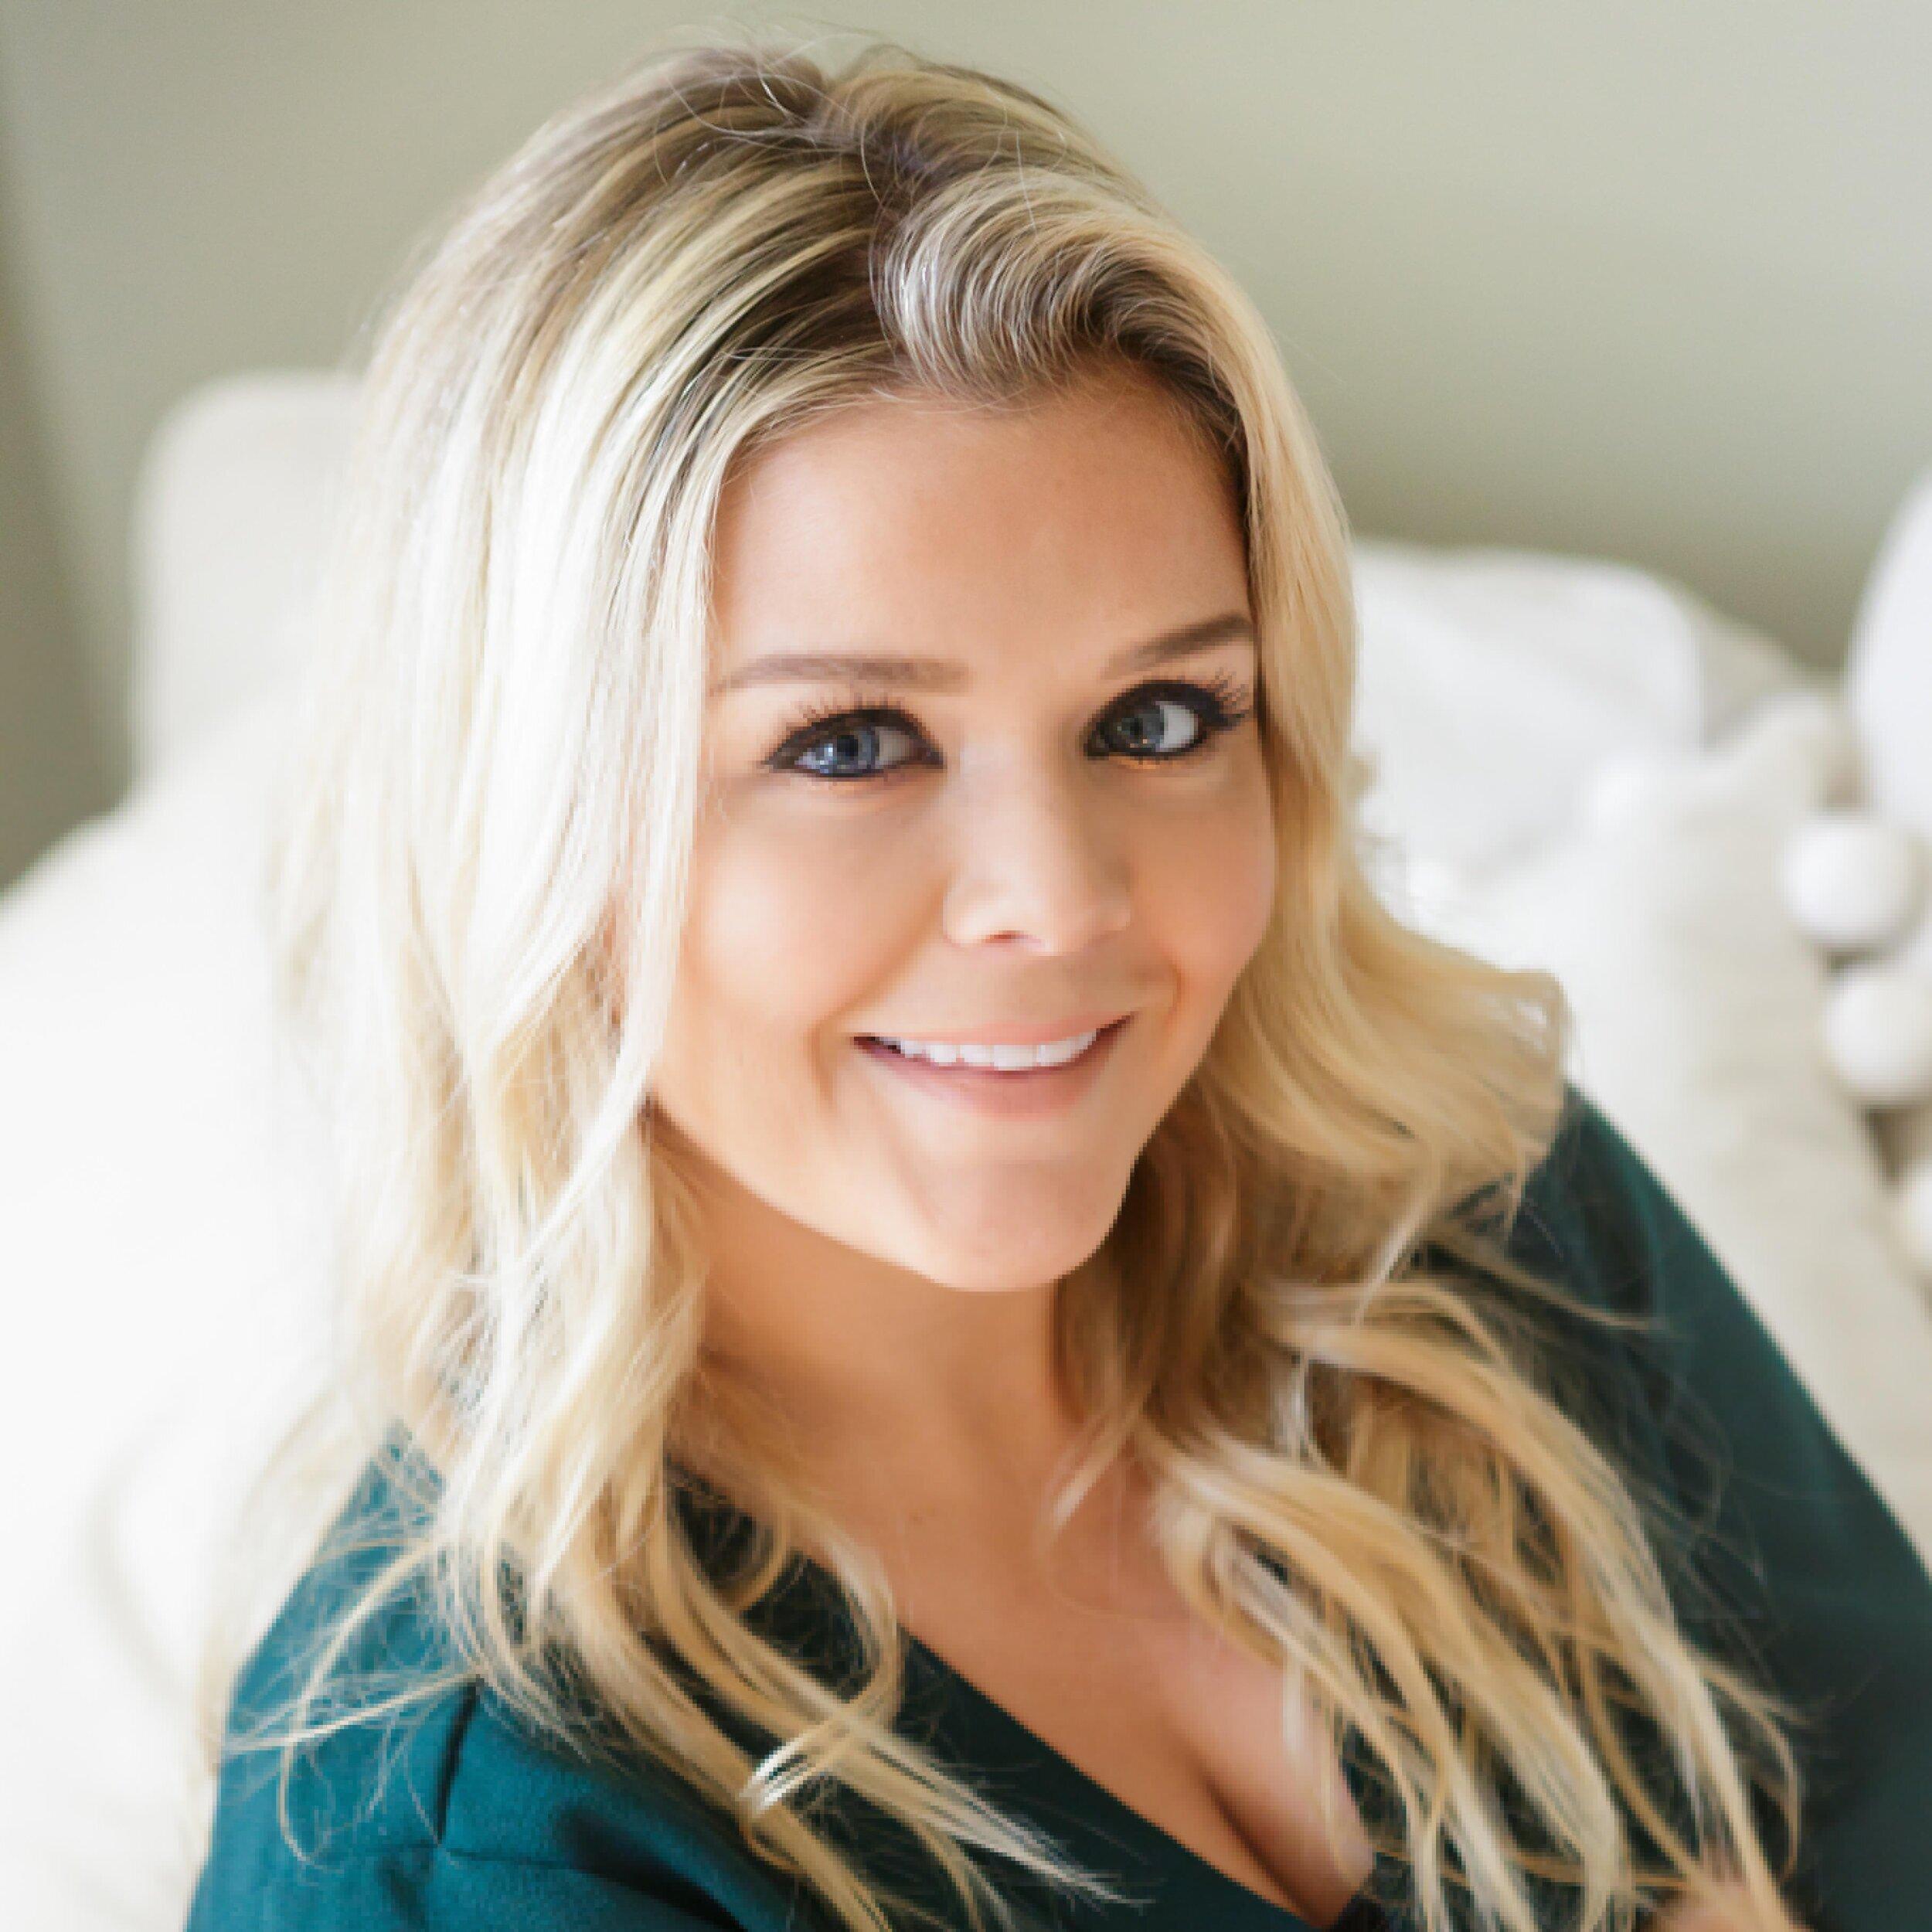 Johnna Heston makeup artistry - Makeup(401) 855-0977johnnaheston.makeup@yahoo.com